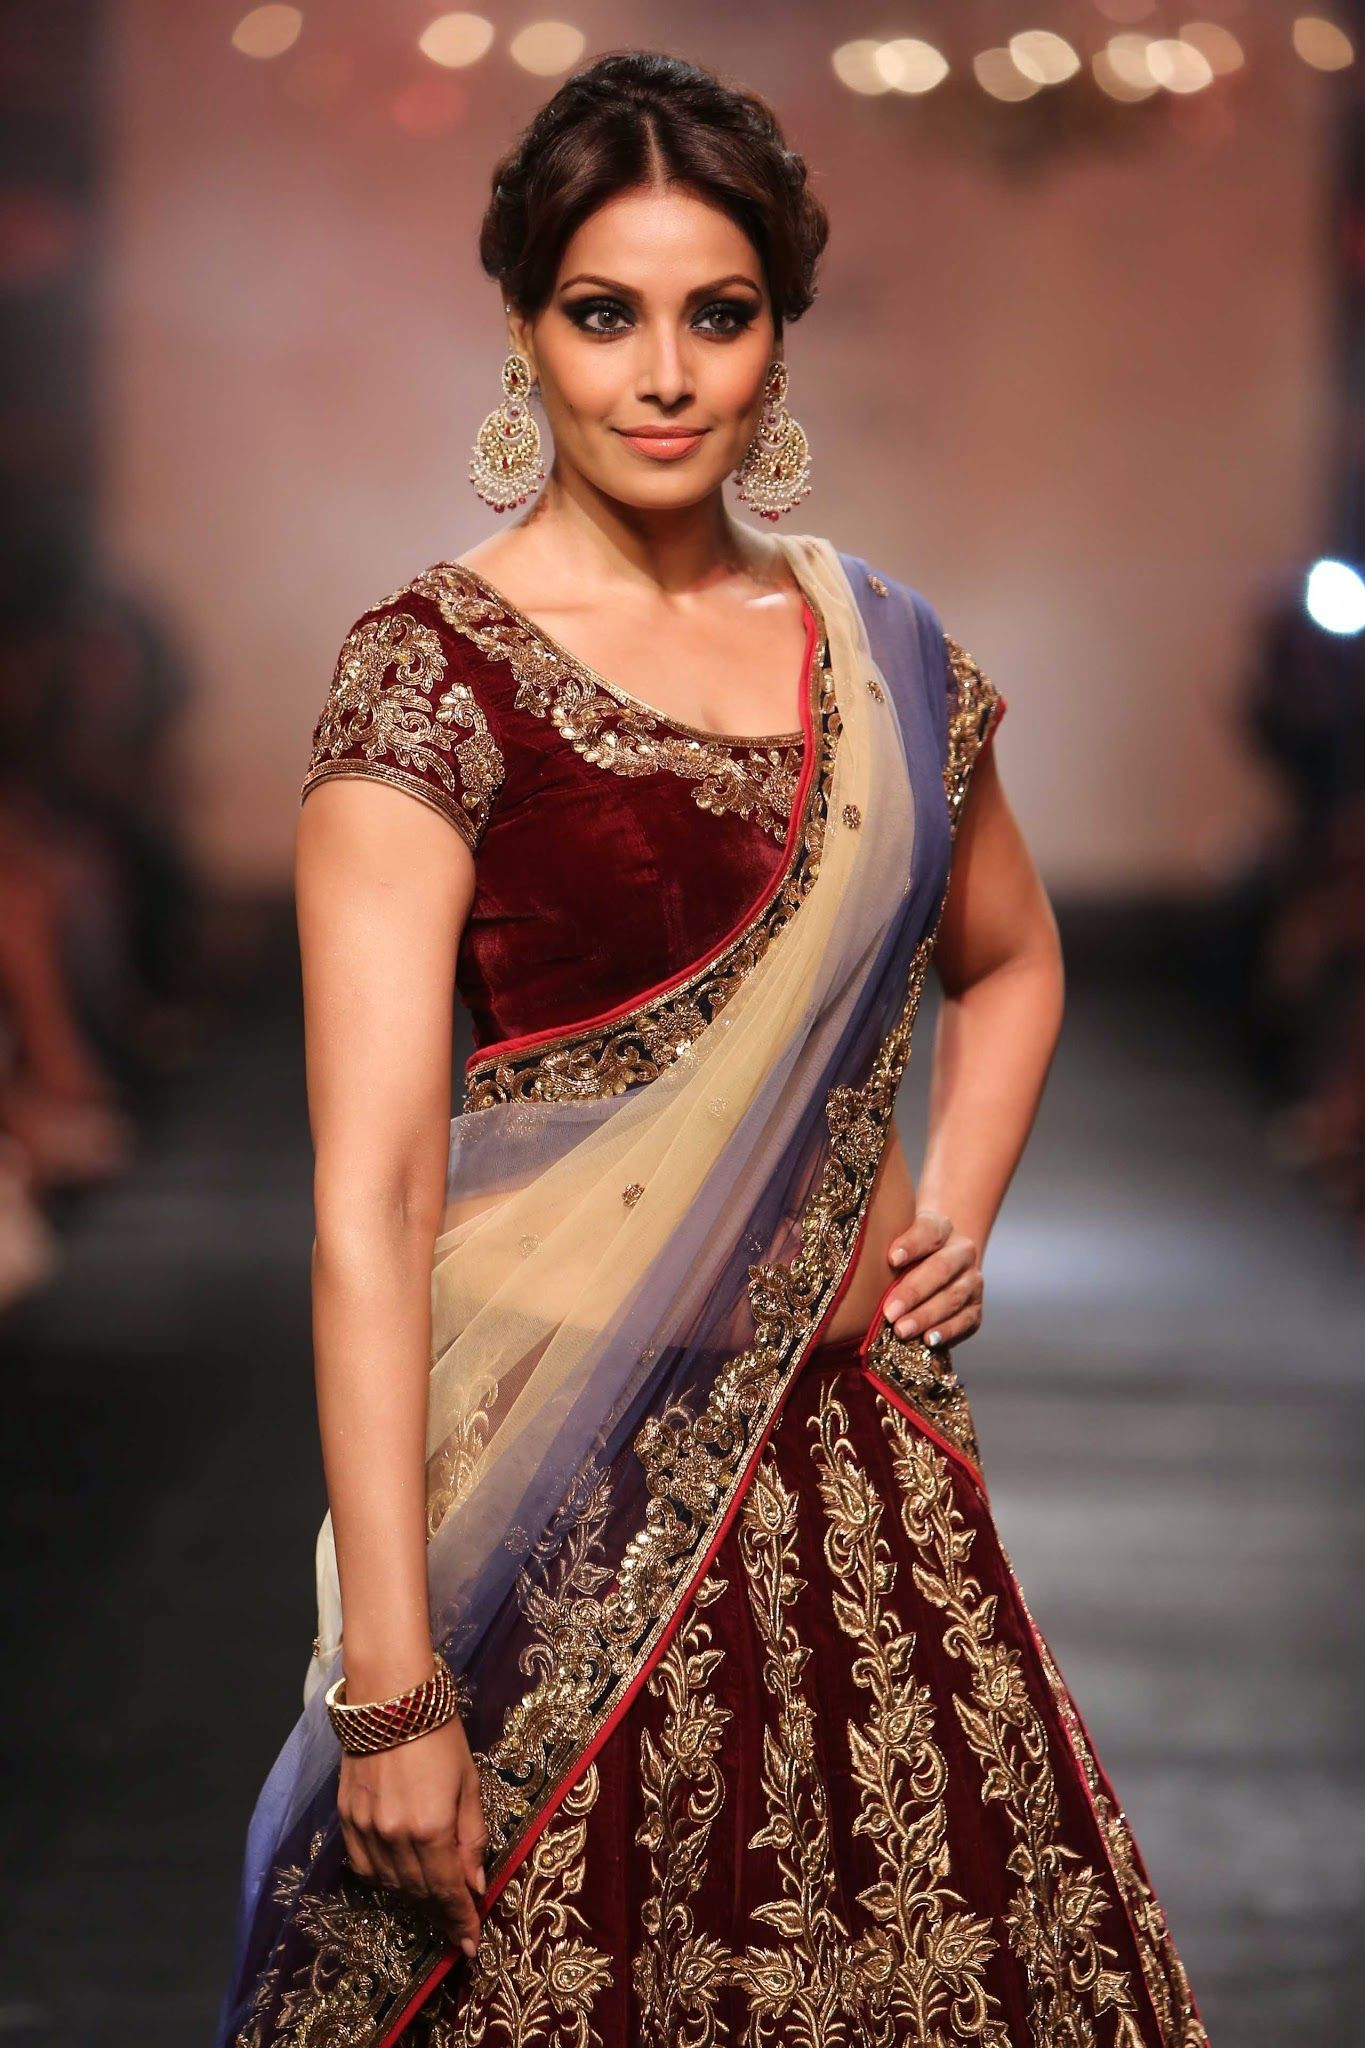 Basu Gorgeous In Saree Bipasha Saree Sari Filmfarephotoshootbikiniharperbazaarmetro Harpervoguebeachgorgeous Sexyboobsbratoplesscleavage